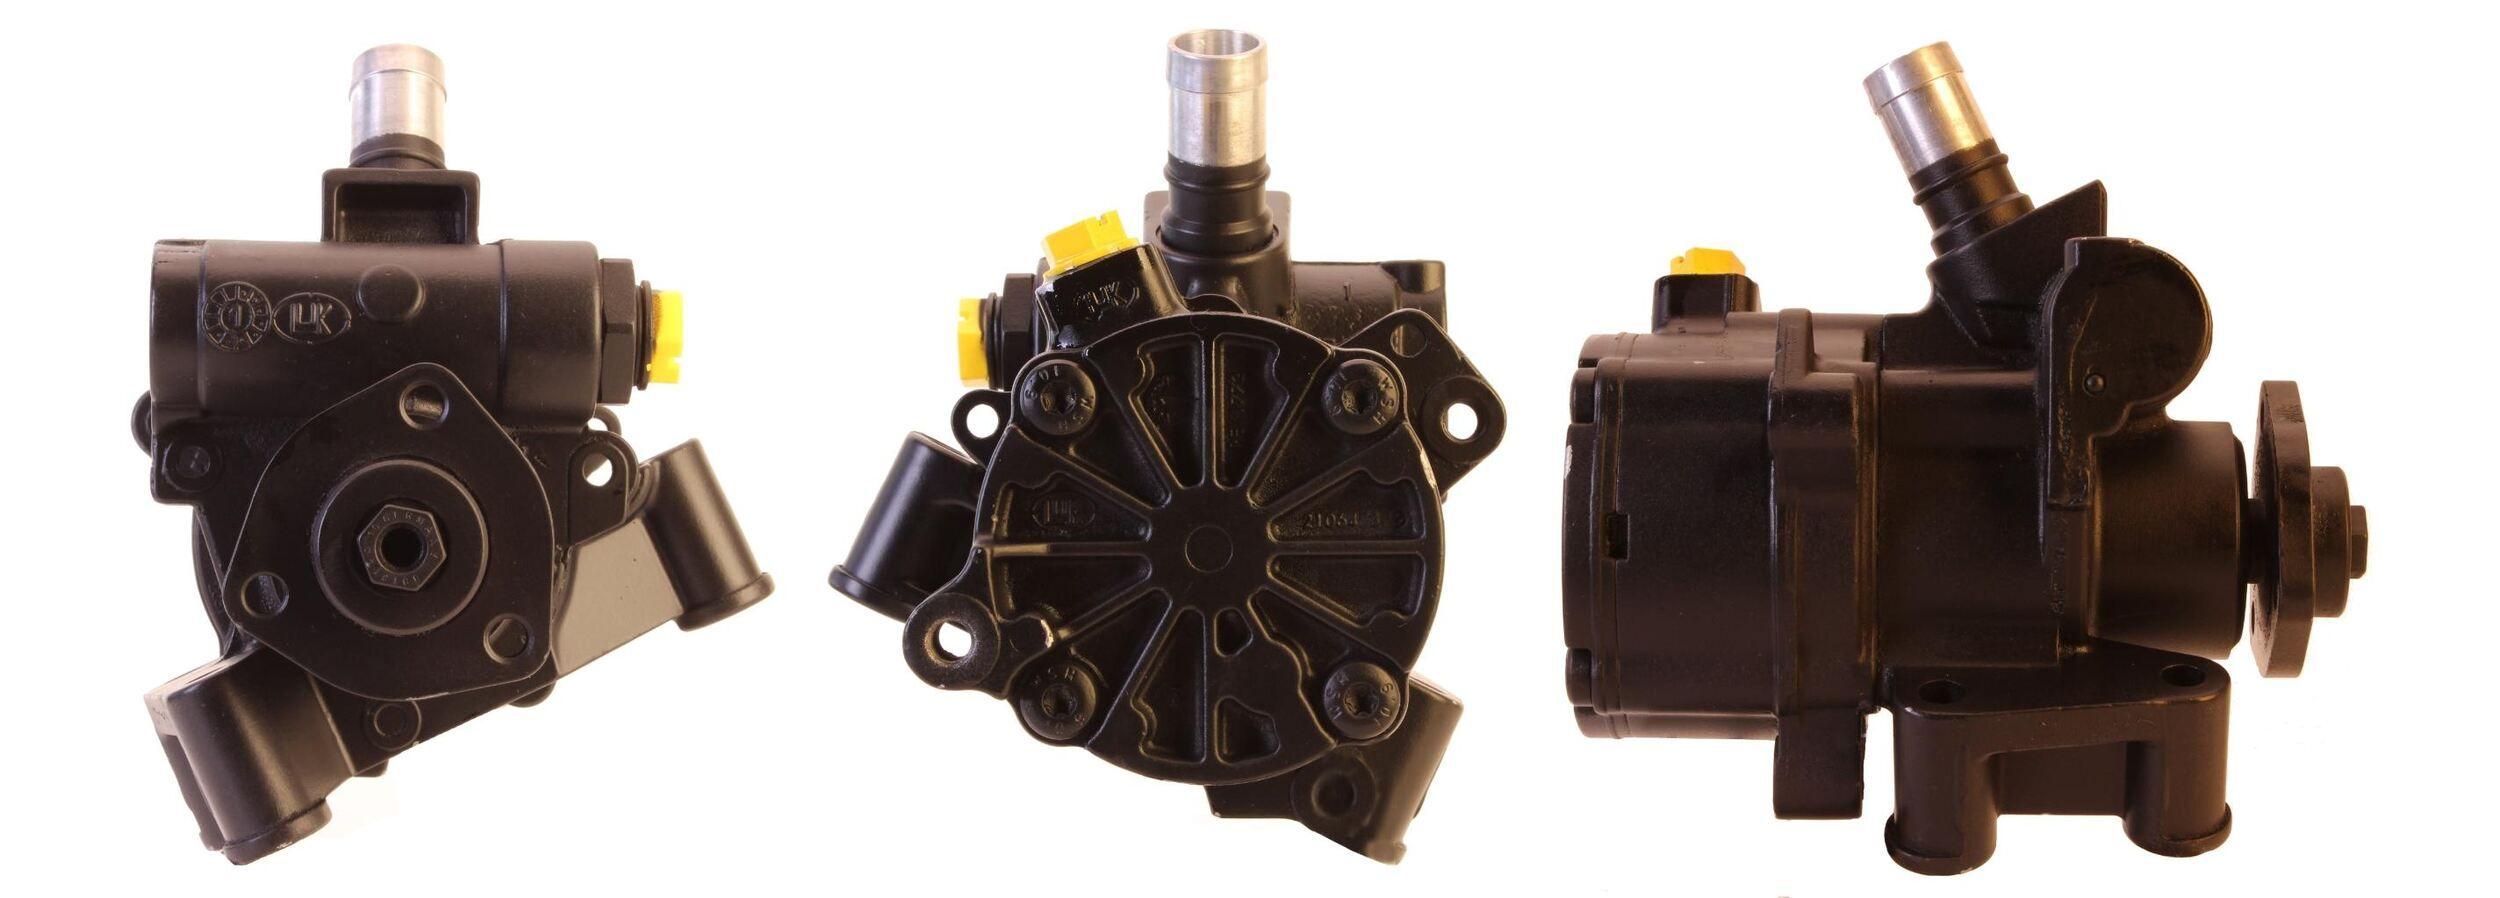 Ohjaustehostimen pumppu 15-0256 ostaa - 24/7!